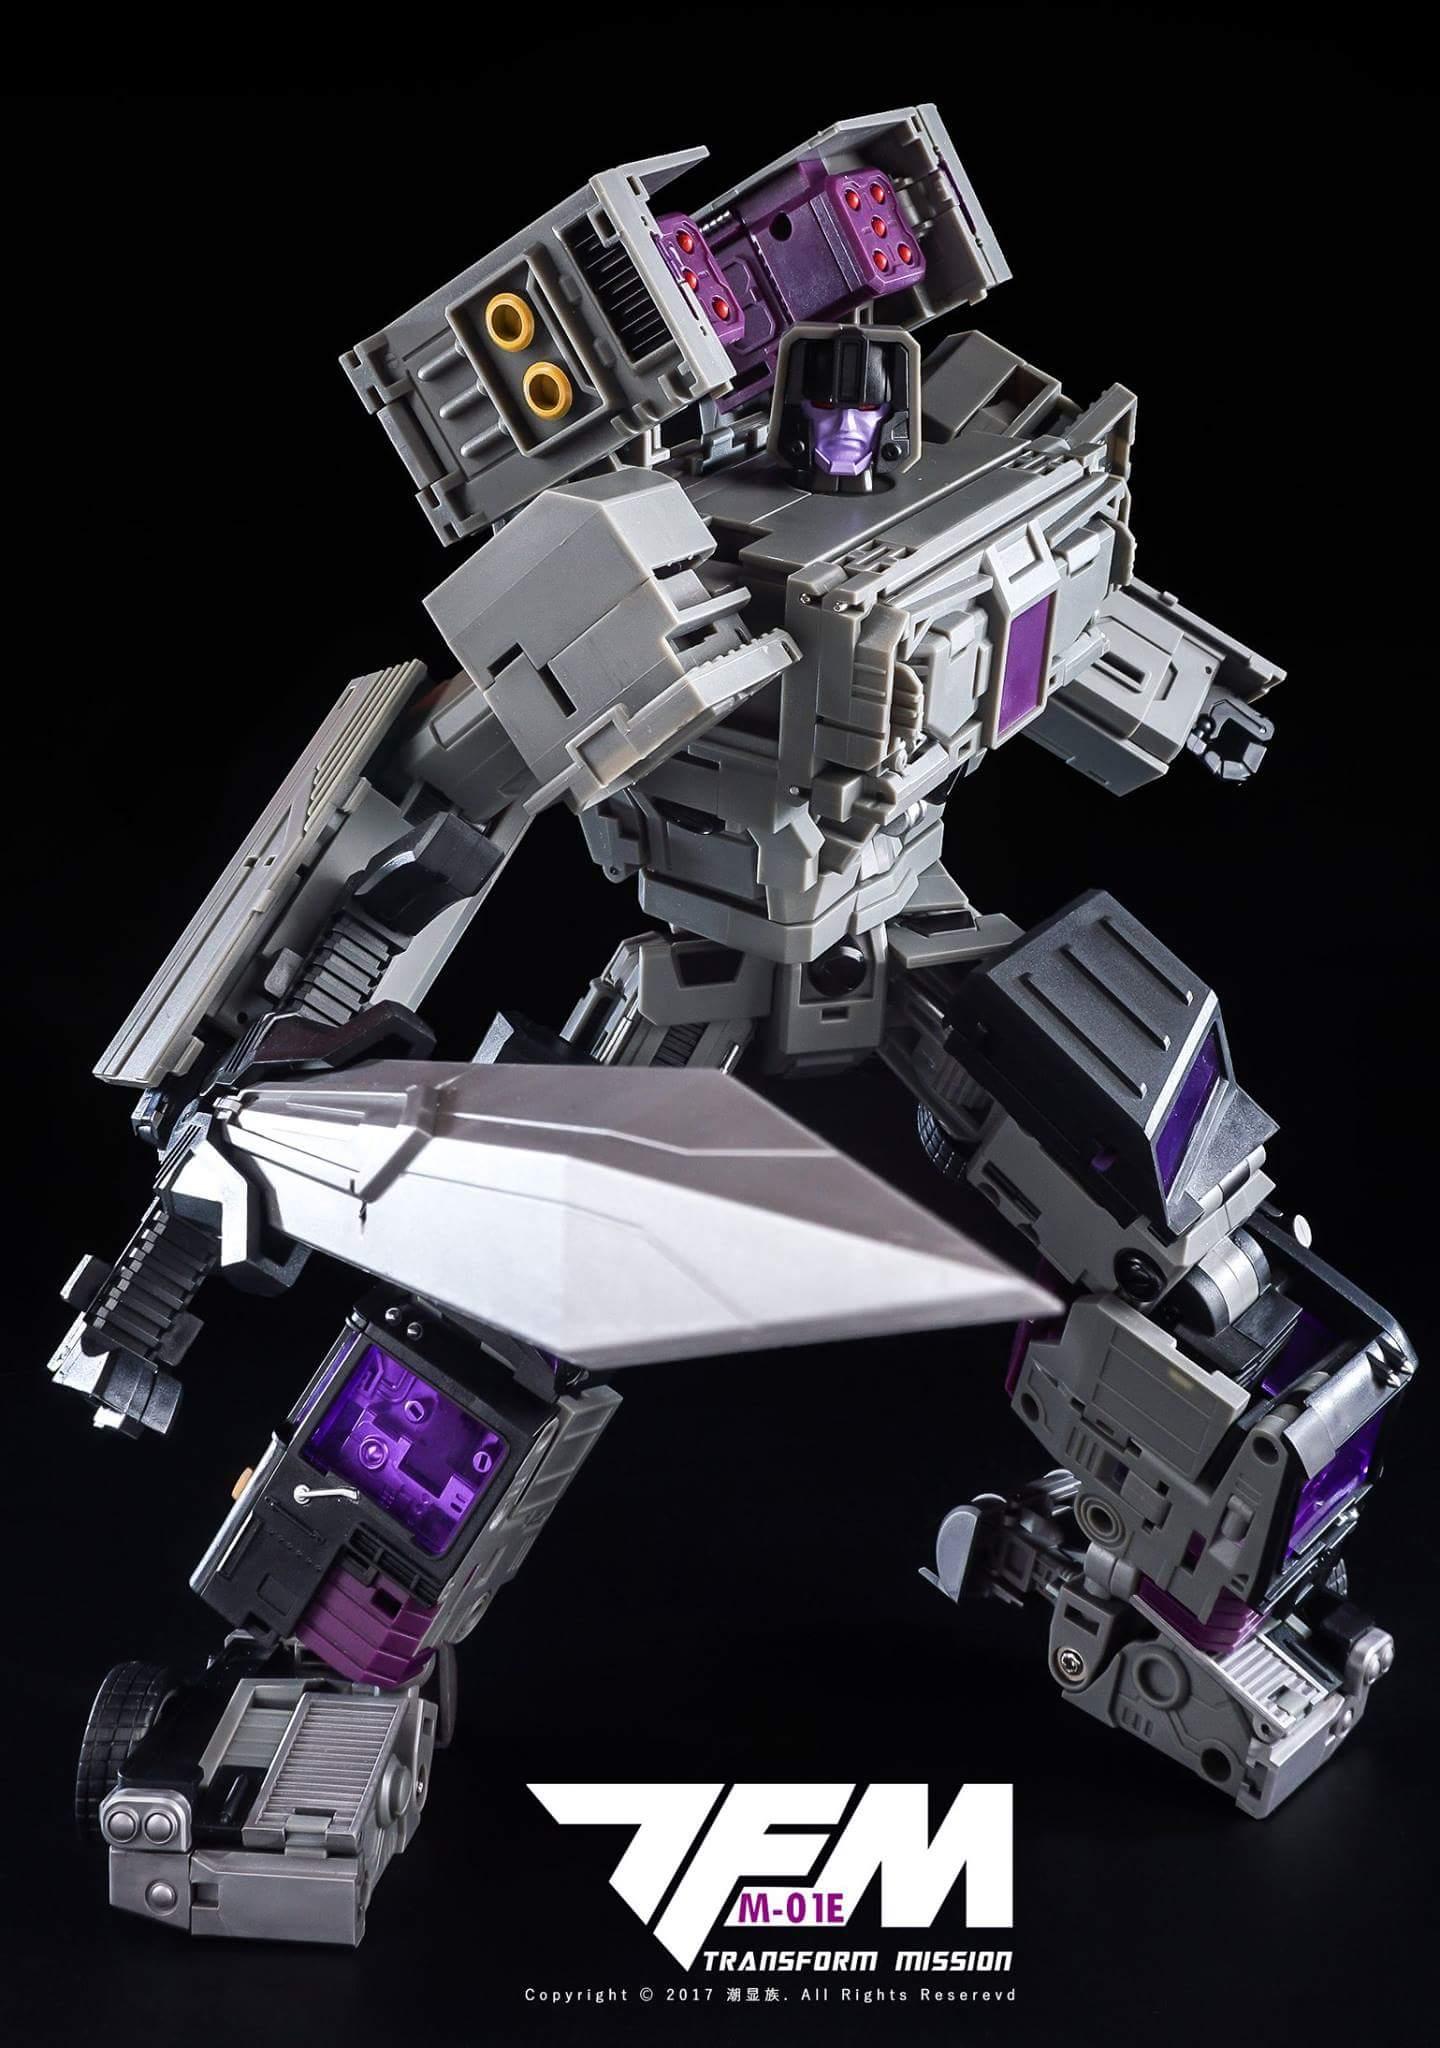 [Transform Mission] Produit Tiers - Jouet M-01 AutoSamurai - aka Menasor/Menaseur des BD IDW - Page 4 X79YB9f3